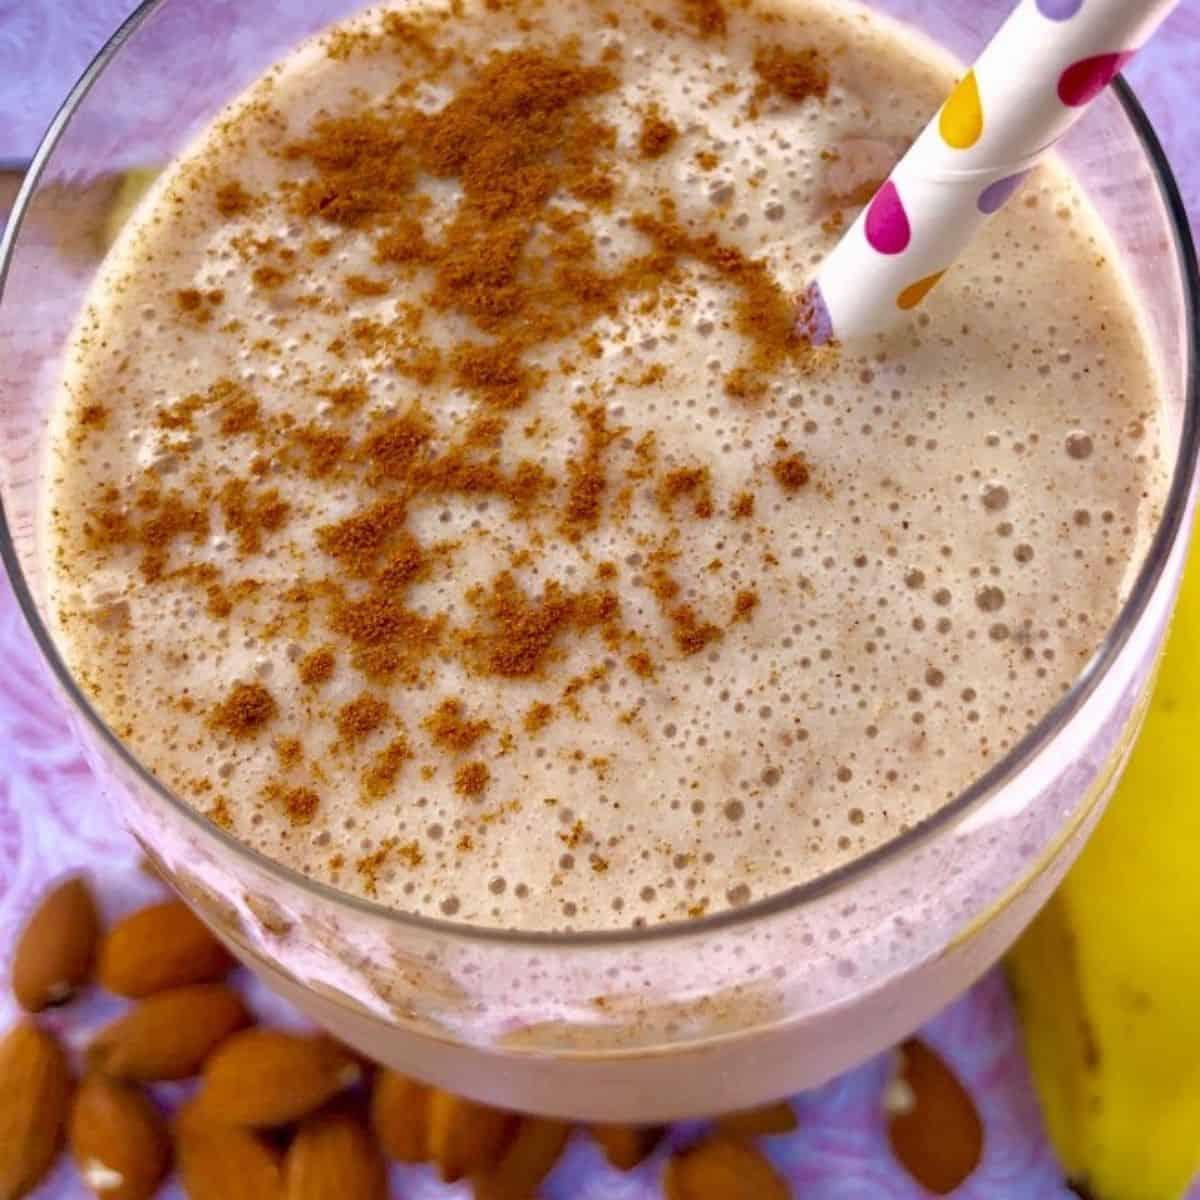 Banana Nut Smoothie 1200x1200 1 - Amanda Seghetti